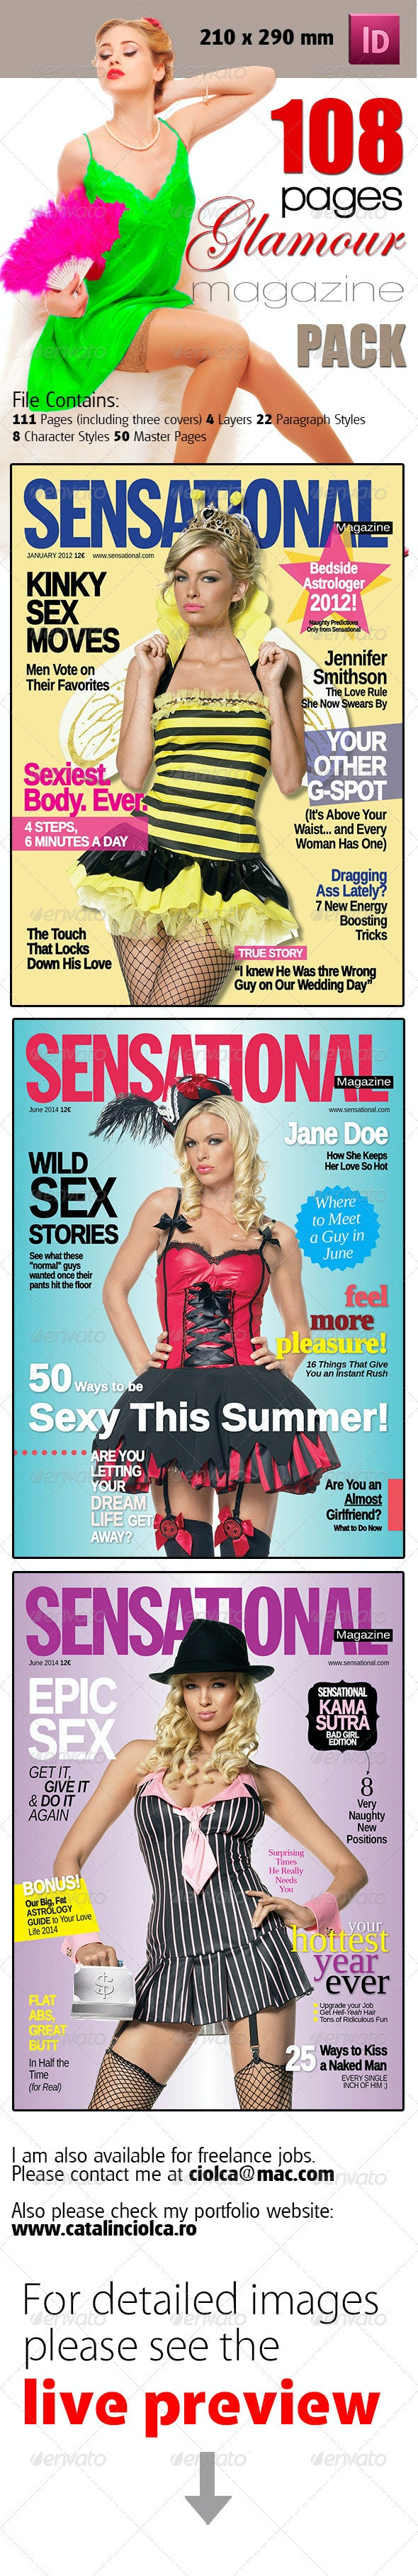 108 Pages Glamour Magazine Bundle - Magazines Print Templates